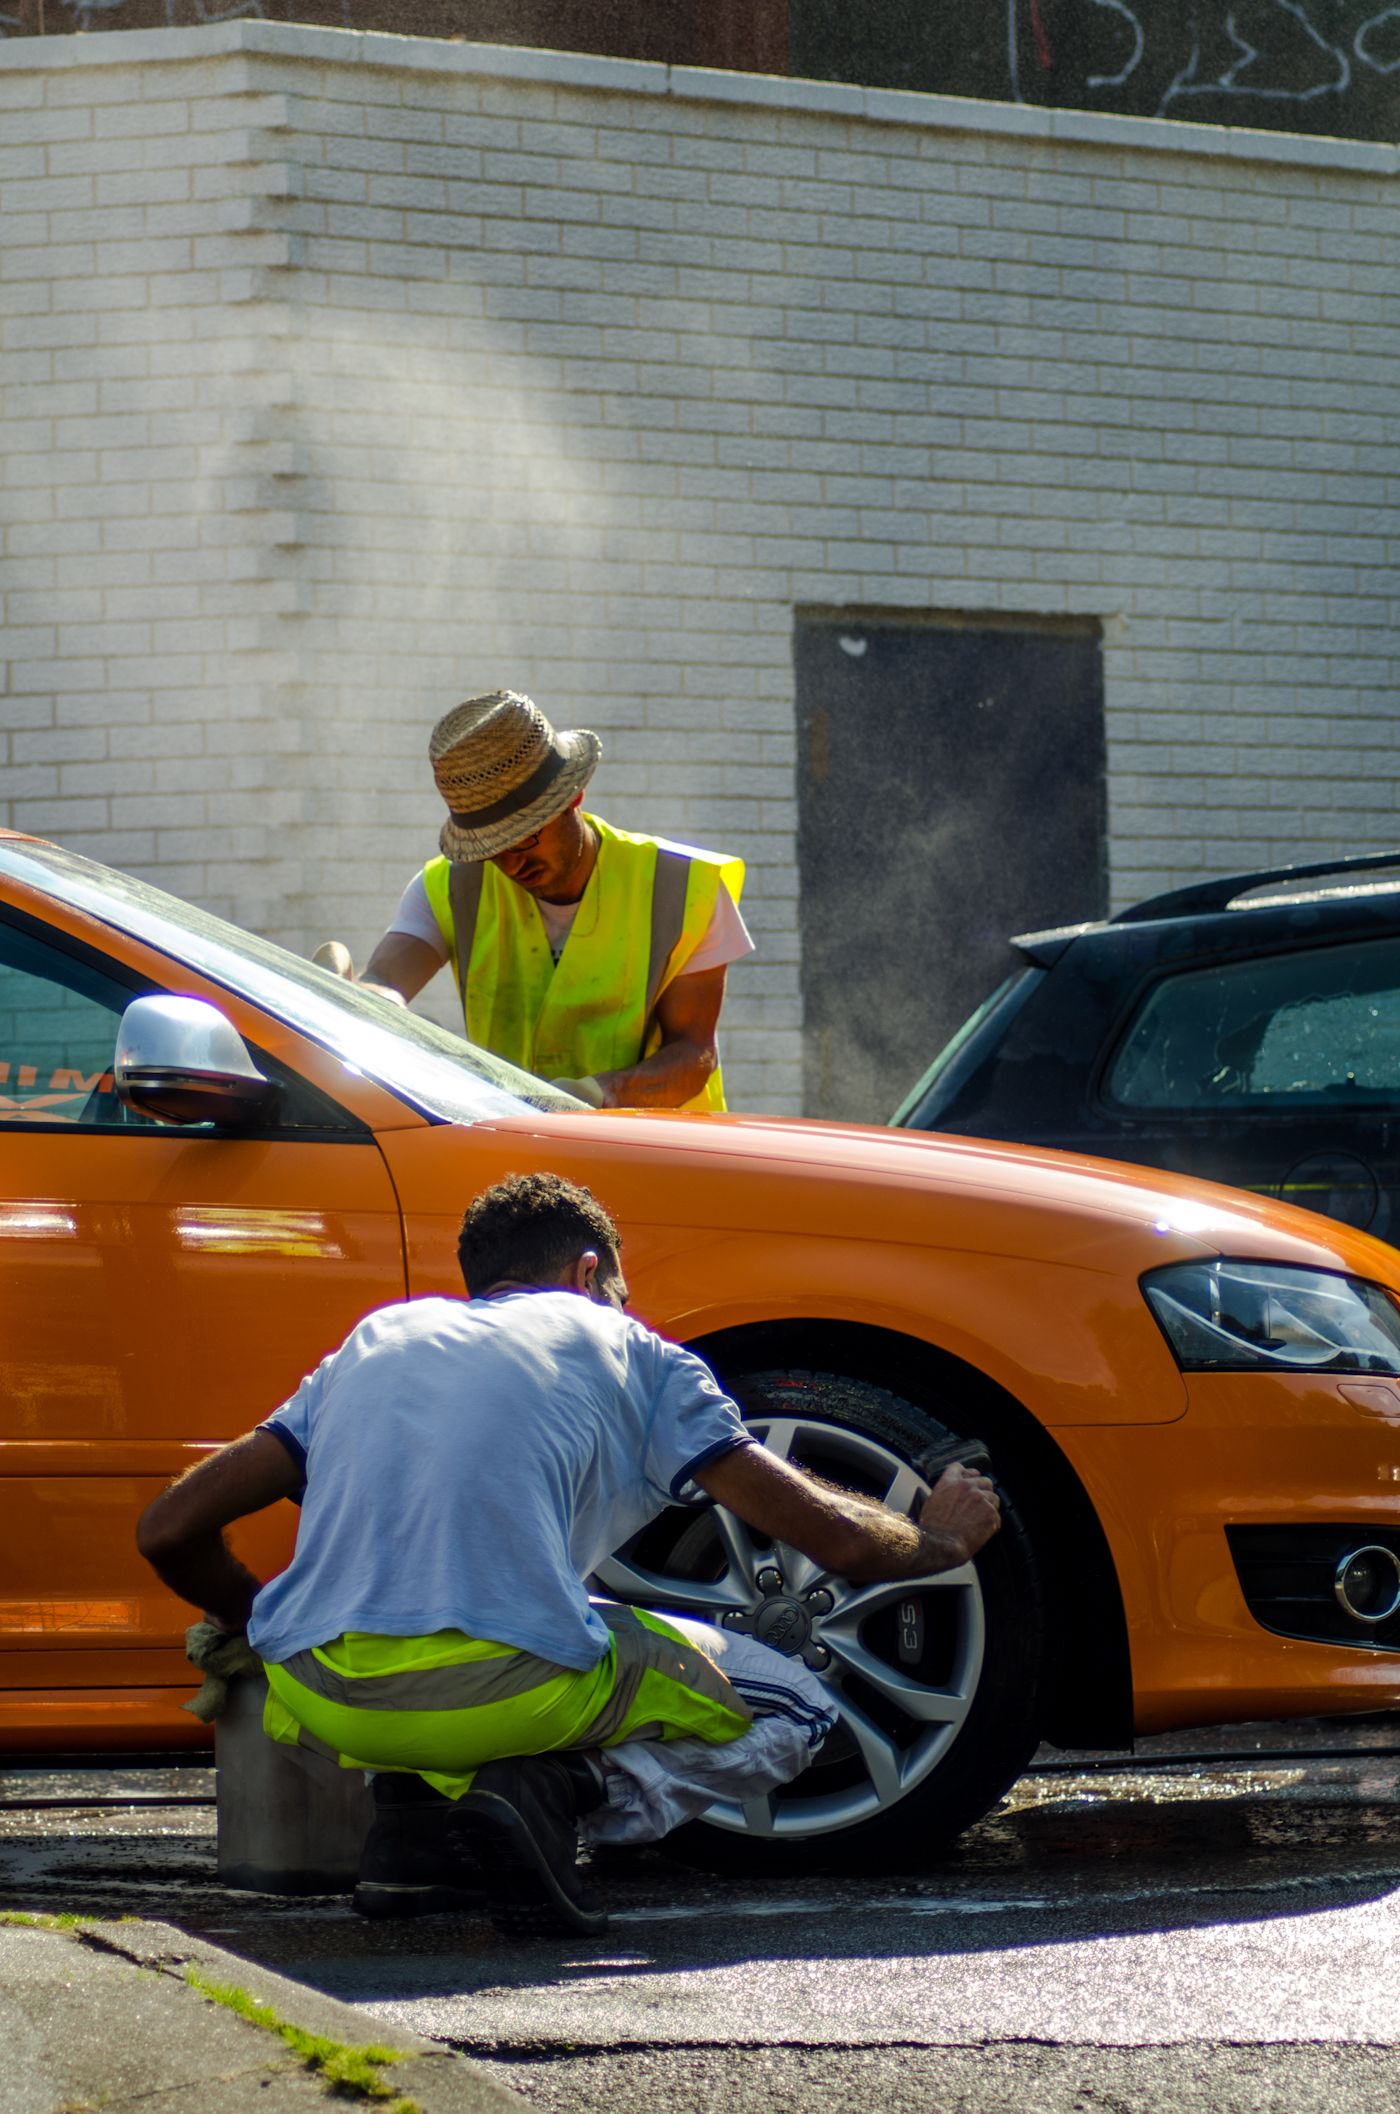 Down at the car wash car wash car photo